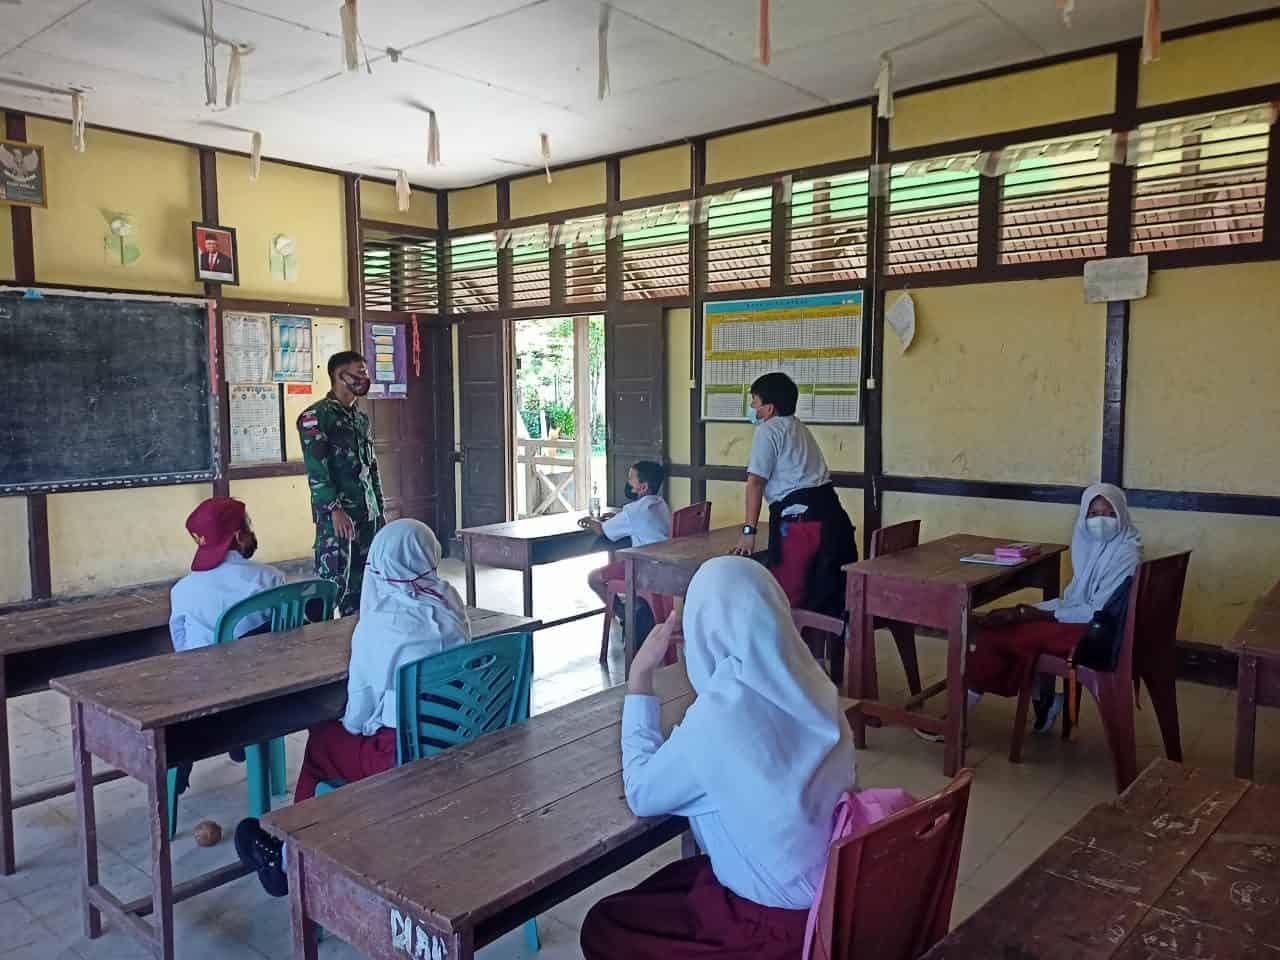 Satgas Yonif 642 Bantu Proses Belajar Mengajar SD Perbatasan